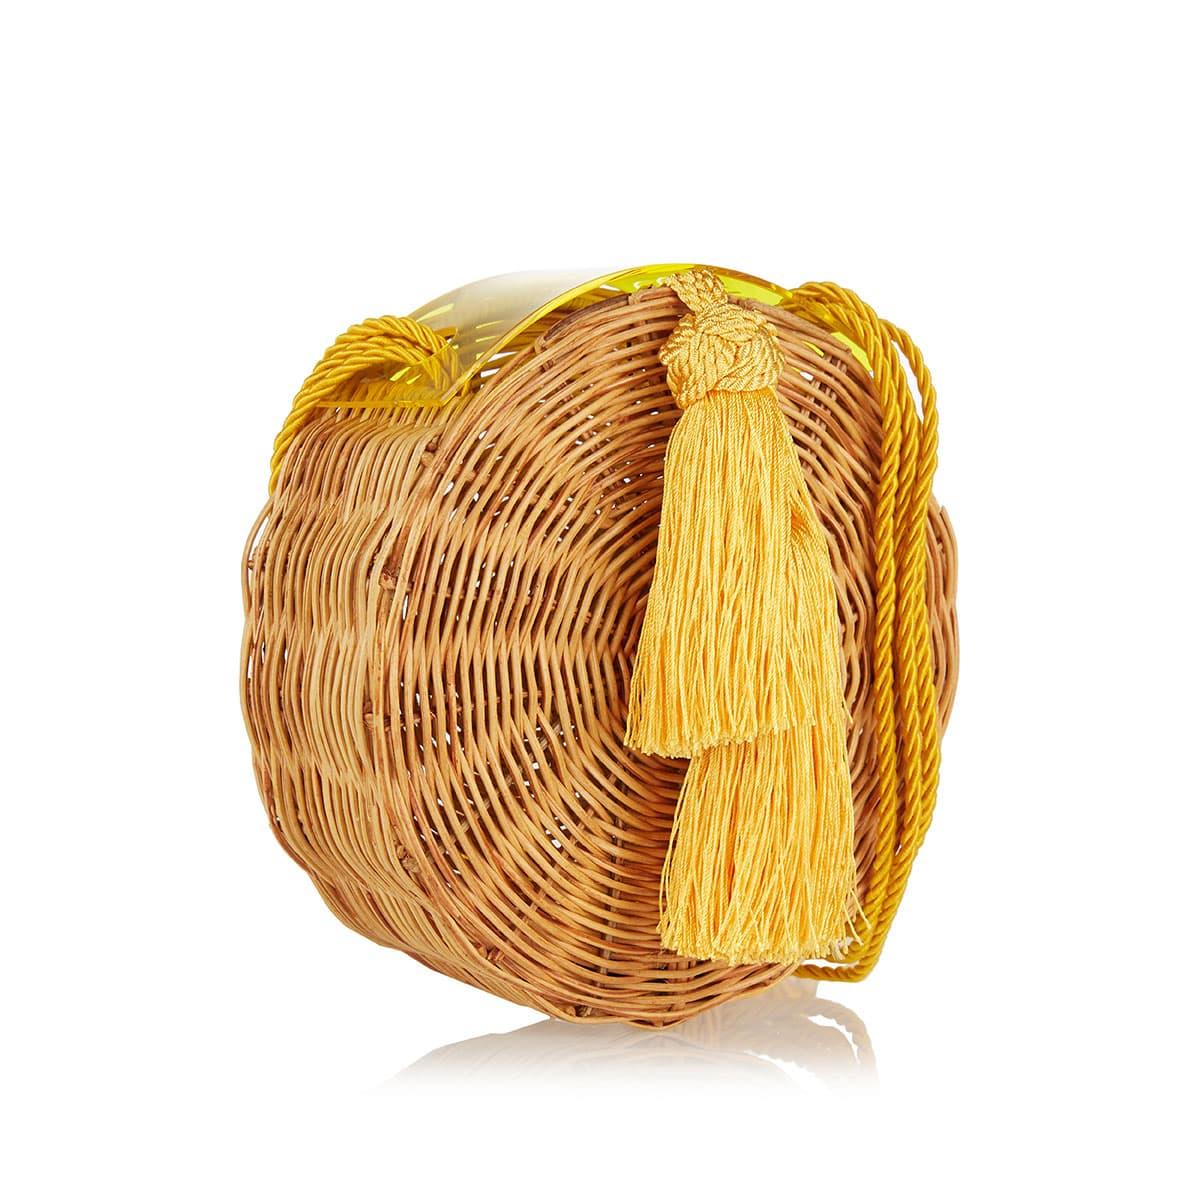 Petit Balaio rattan round bag